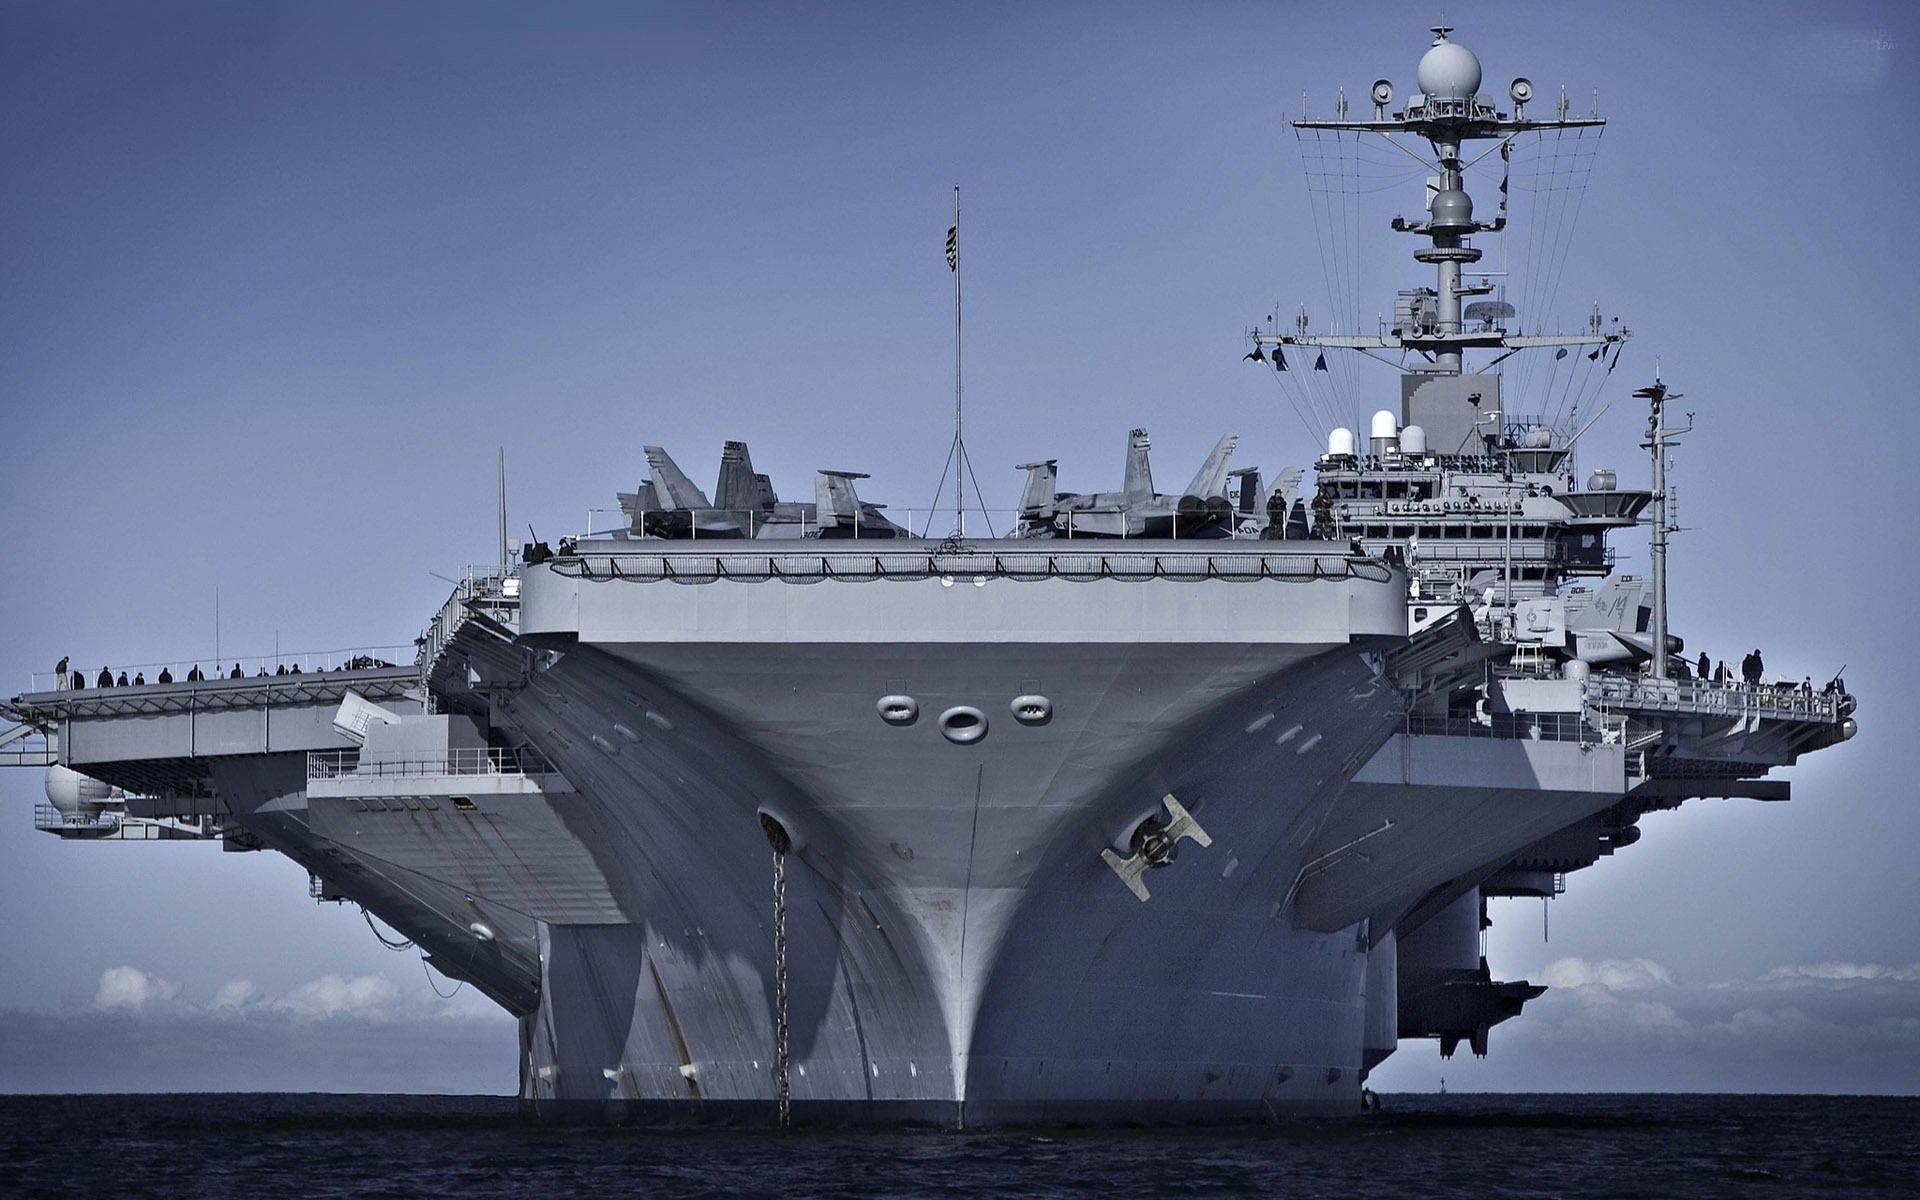 Navy ships boat ship military warship battleship wallpaper   1920x1200